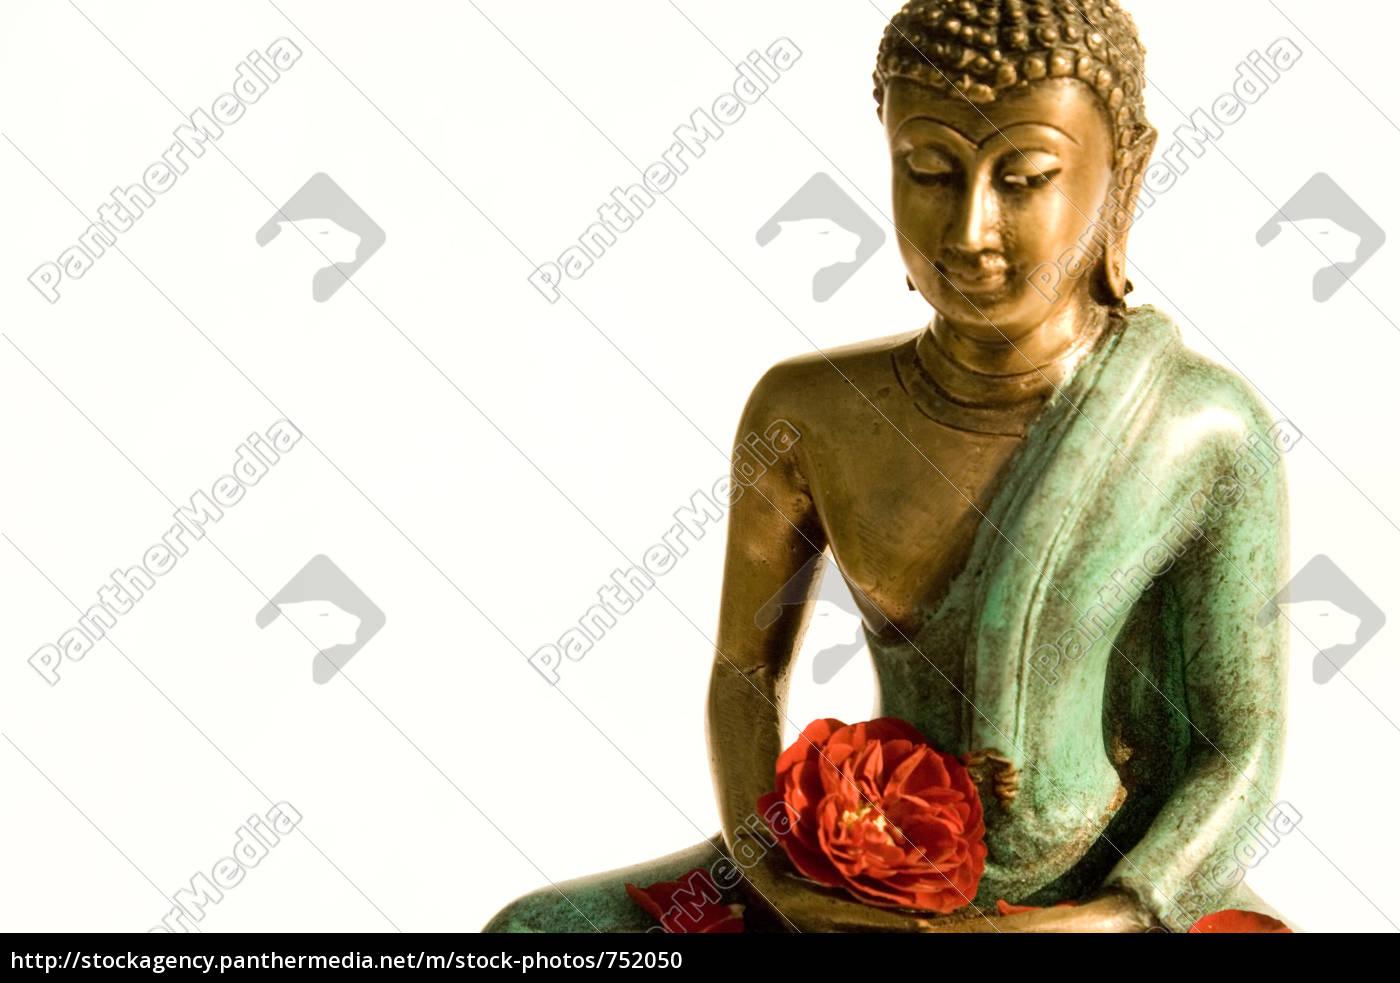 buddha - 752050